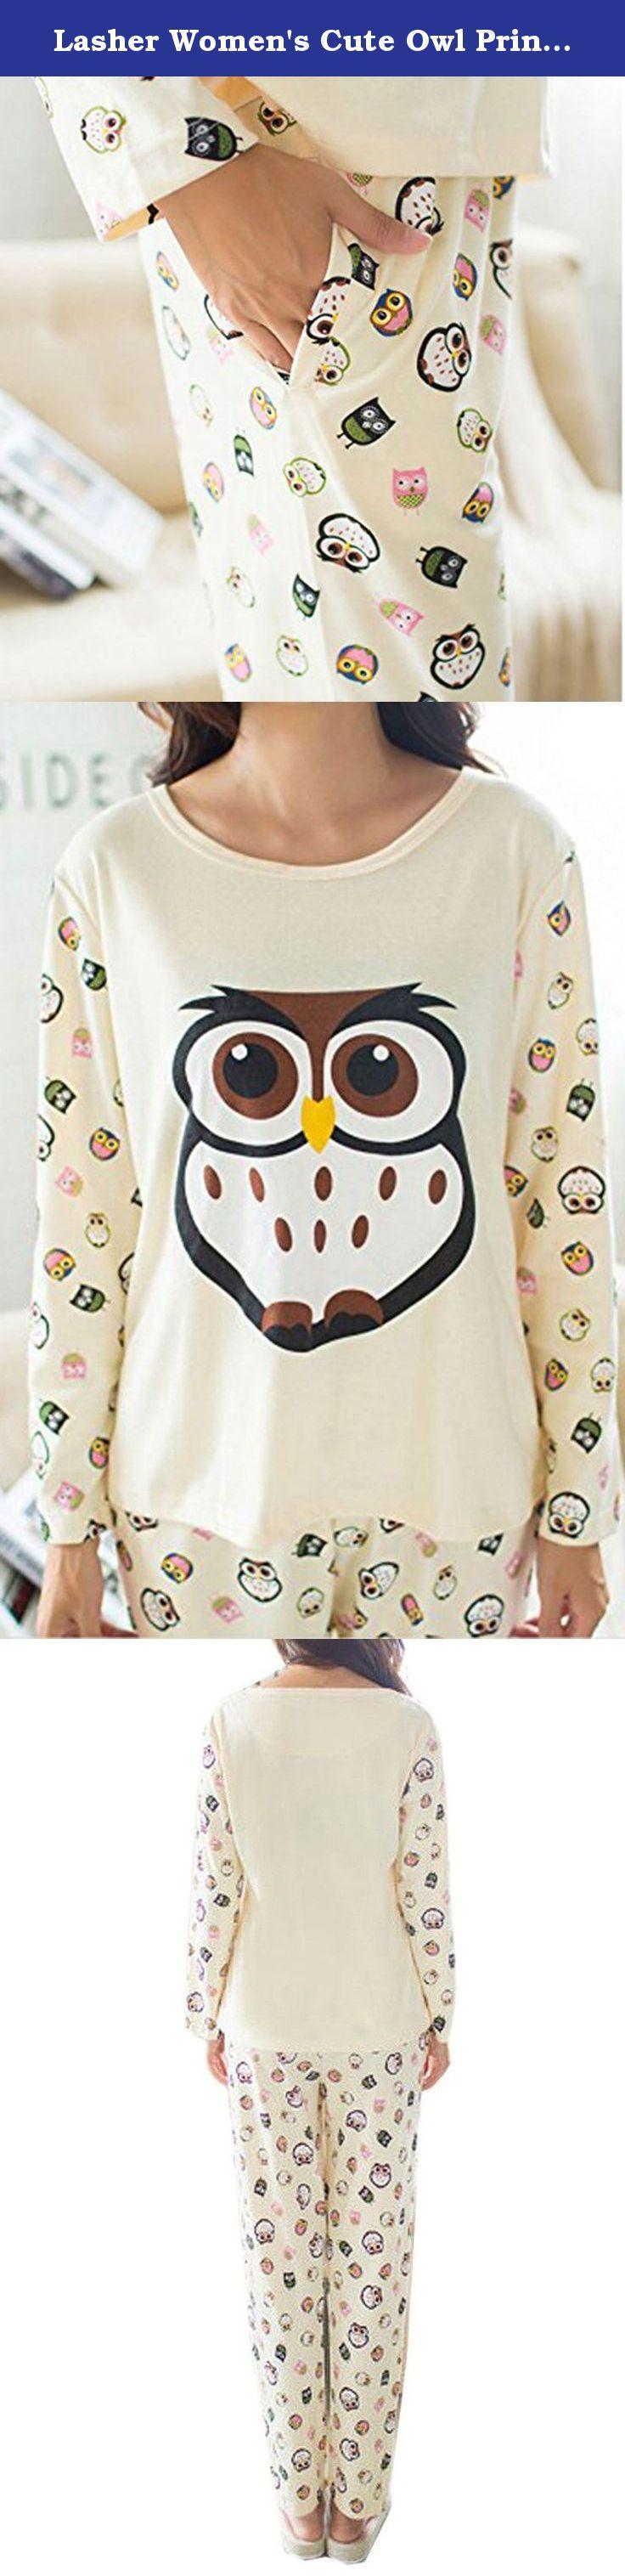 172 Cm 50 Kg lasher women's cute owl printed long sleeve sleepwear paj